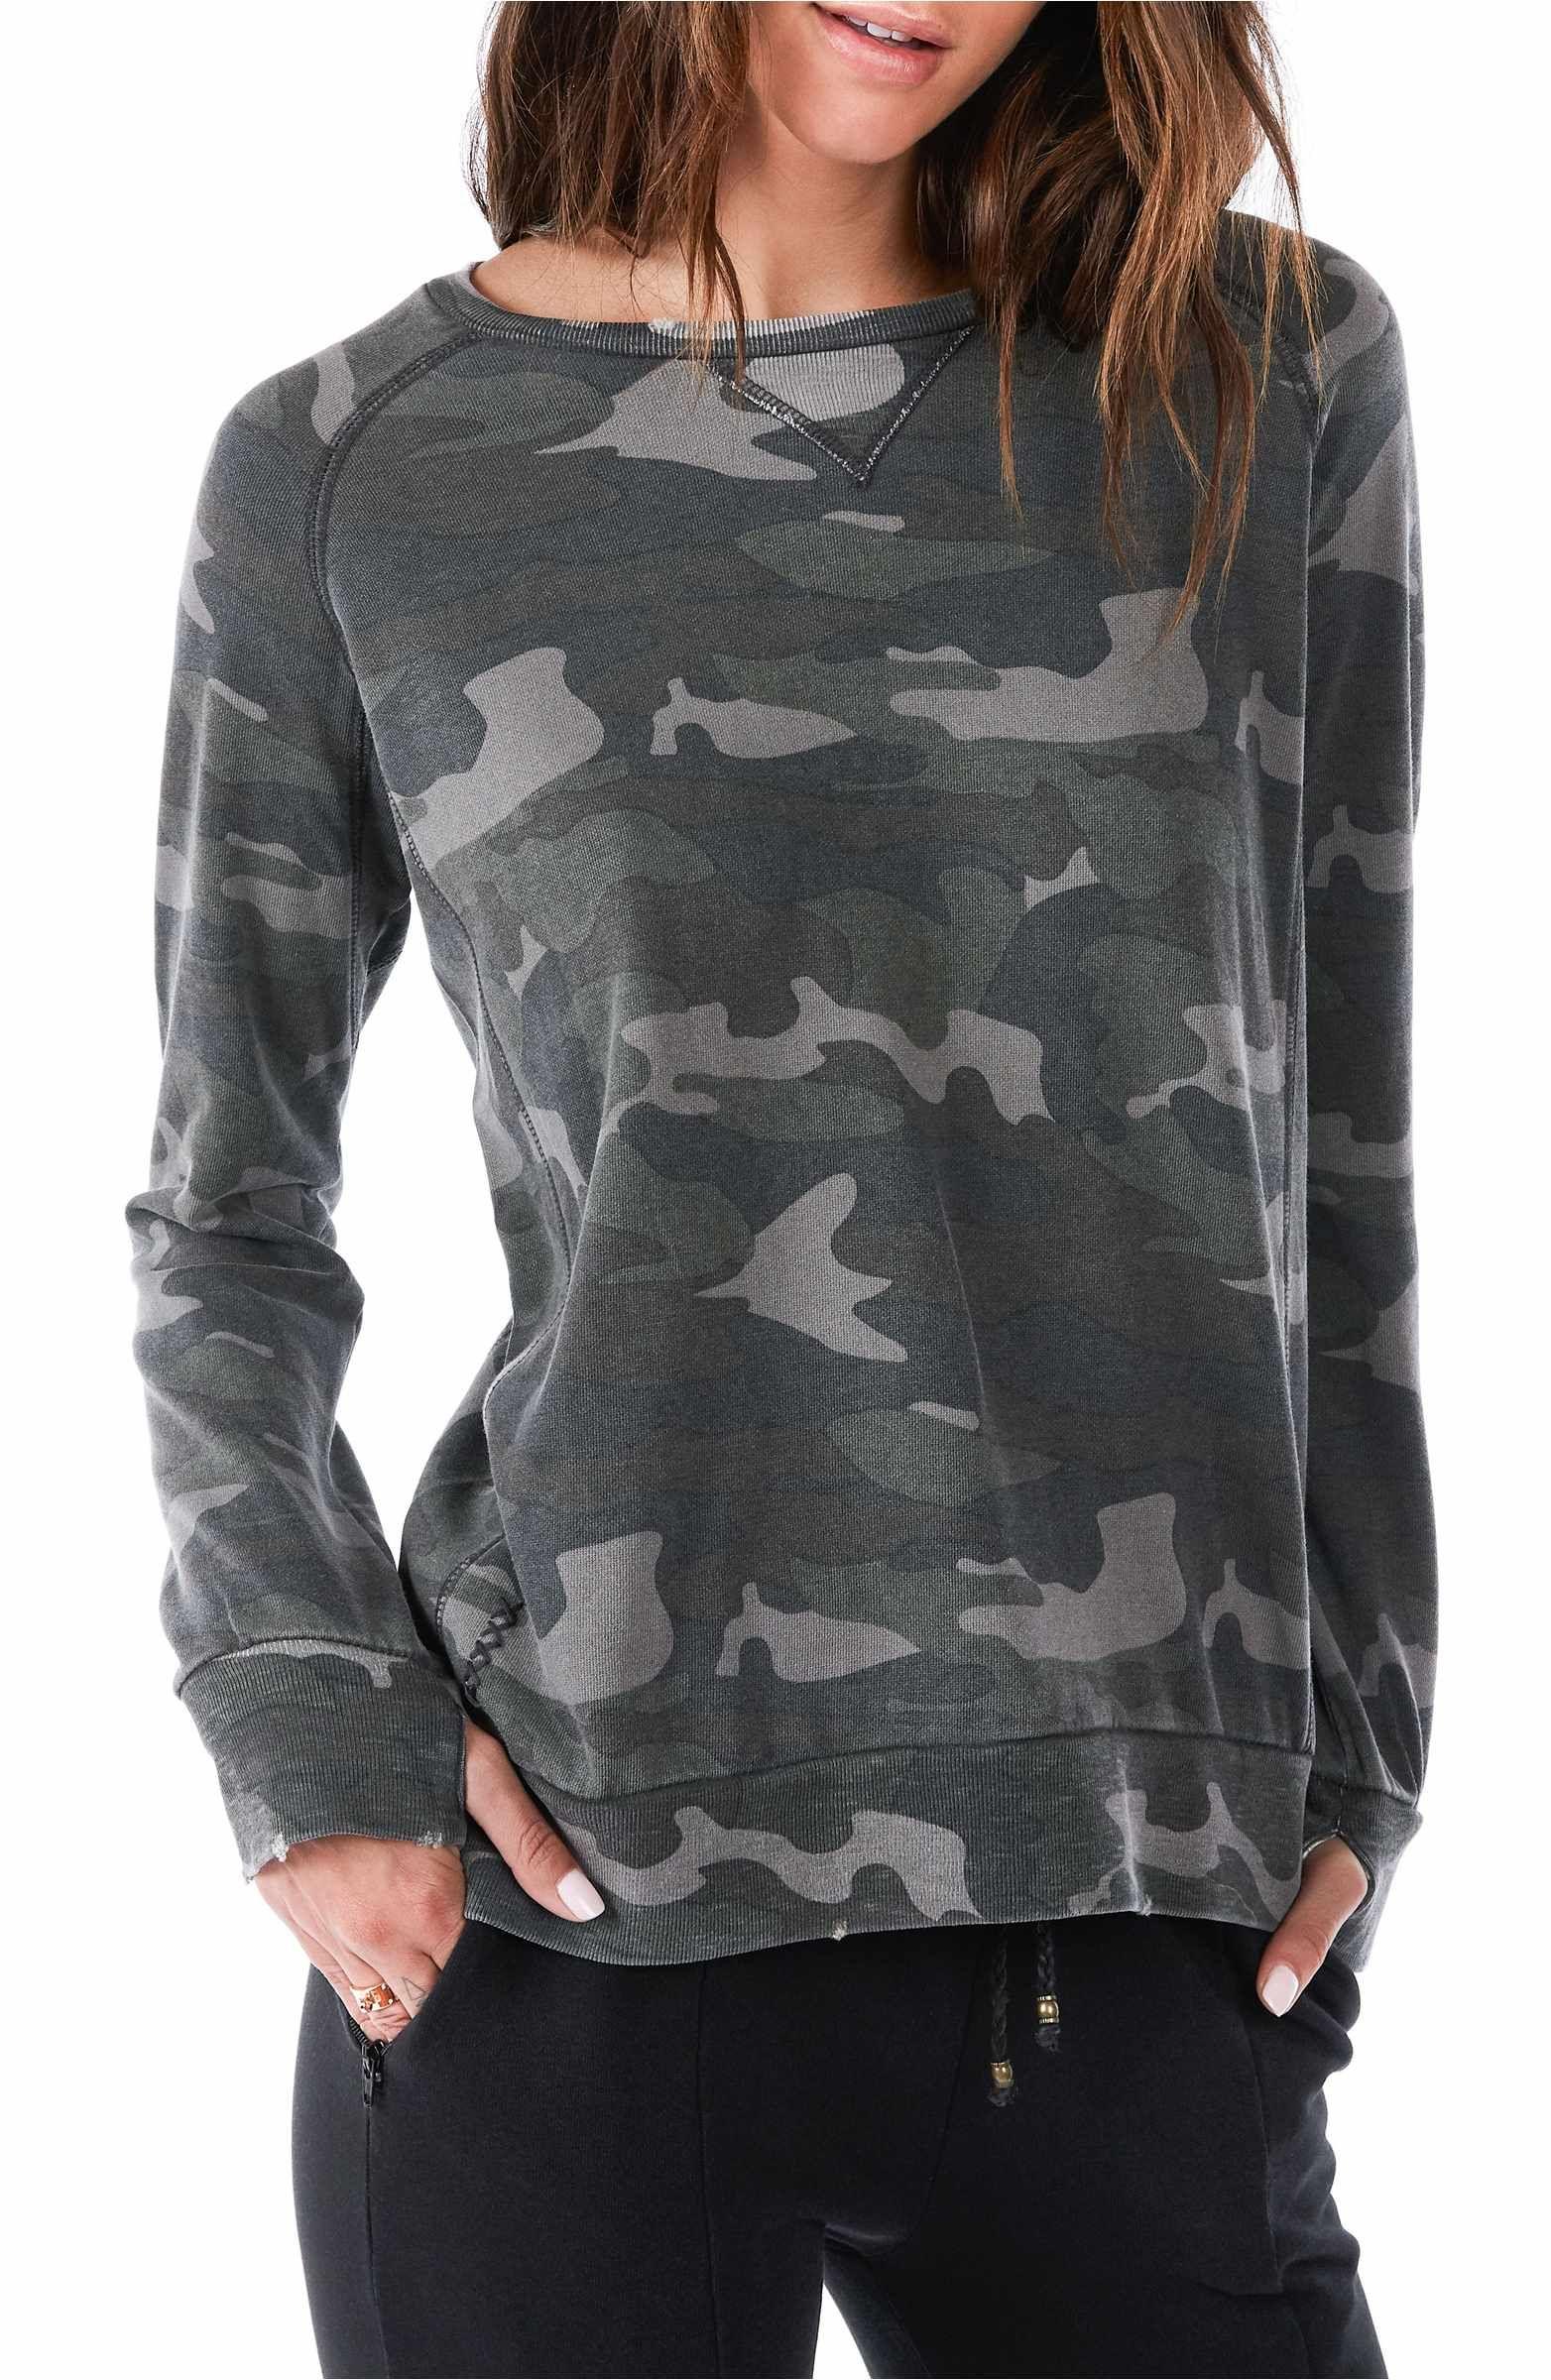 f46f4f666b677c Main Image - Ragdoll Distressed Camo Sweatshirt | Clothing | Camo ...